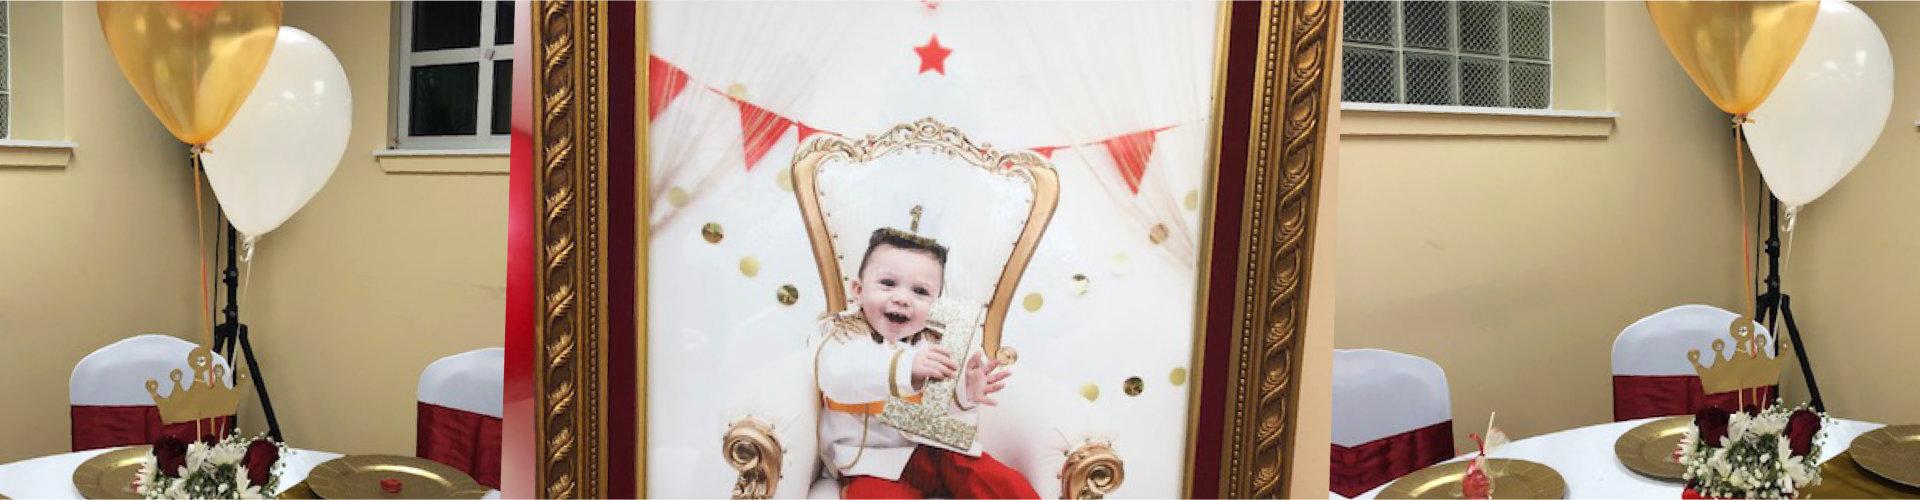 baby picture celebrating birthday